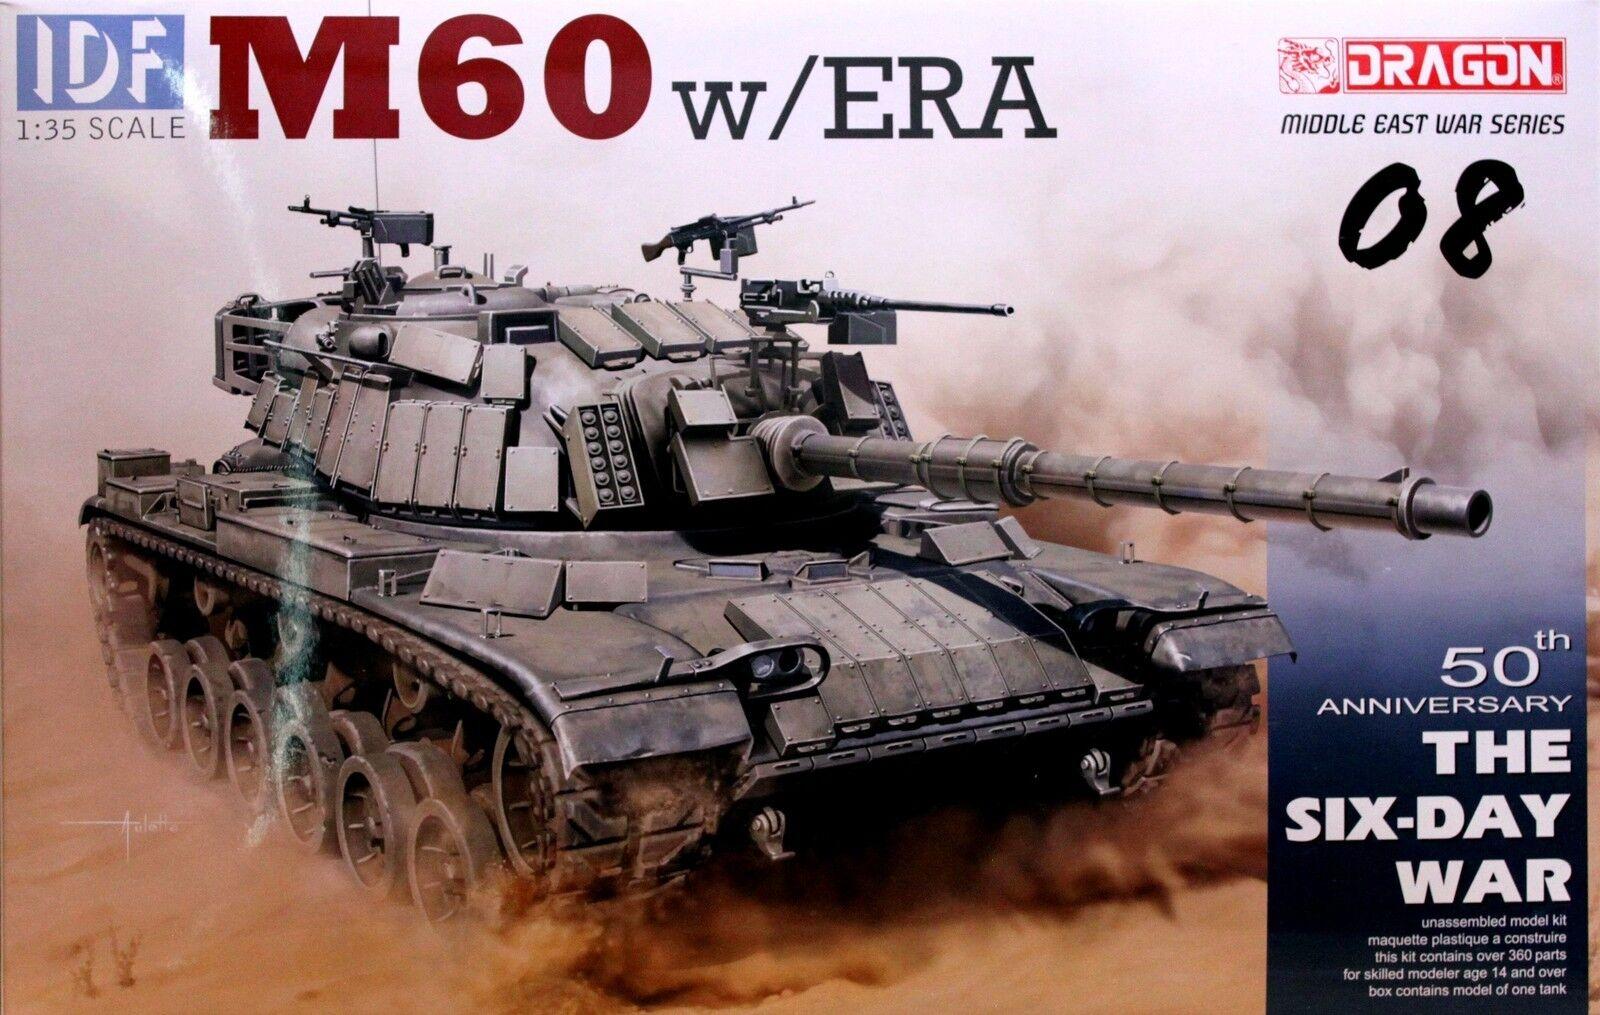 Dragon 1 35 3581 IDF M60 w ERA (The Six-Day War) (Middle East War Series)